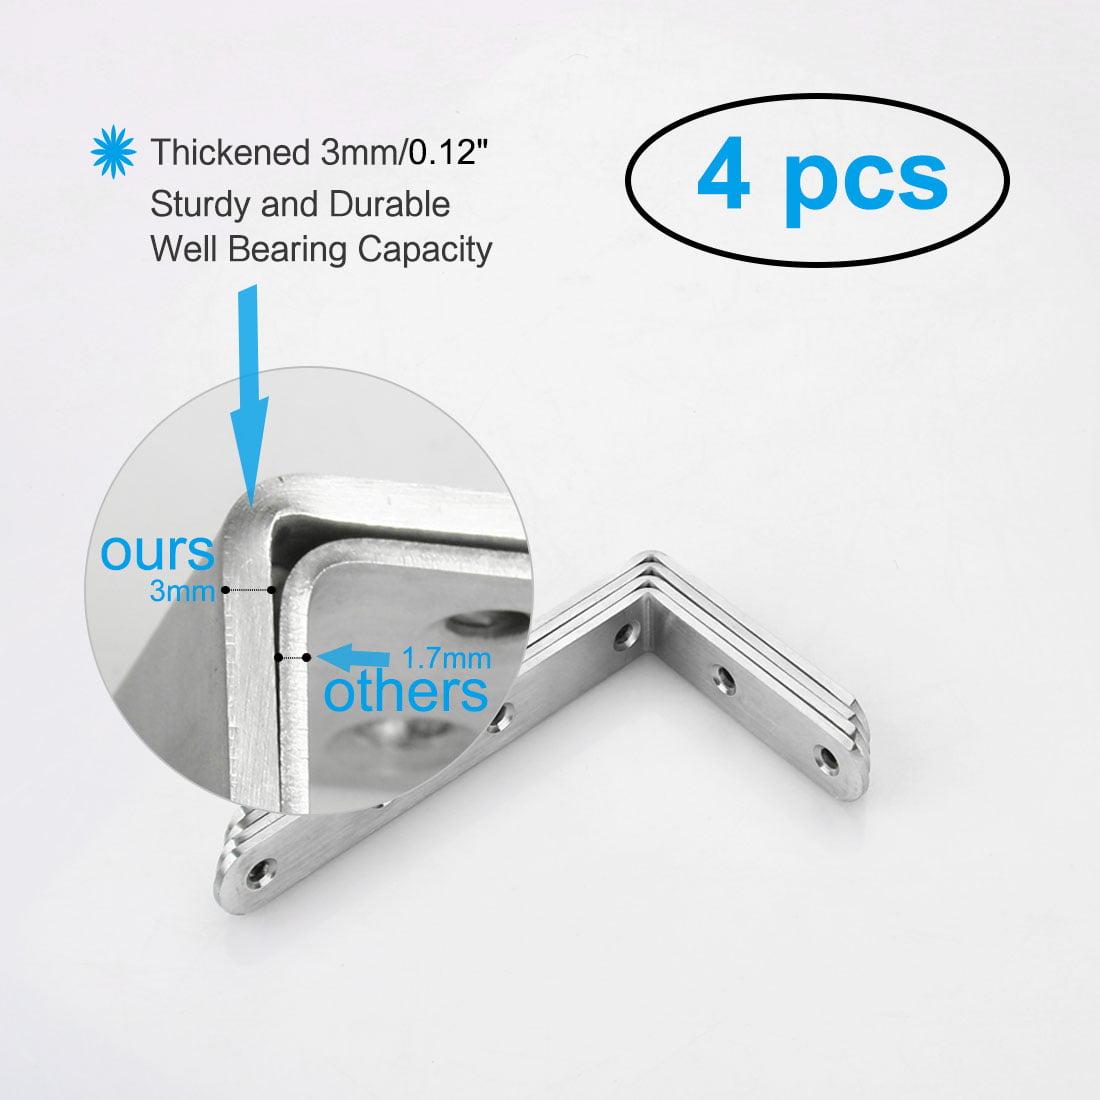 Angle Brackets Stainless Steel Brace Fastener Support w Screws 125 x 75mm, 4pcs - image 6 de 7